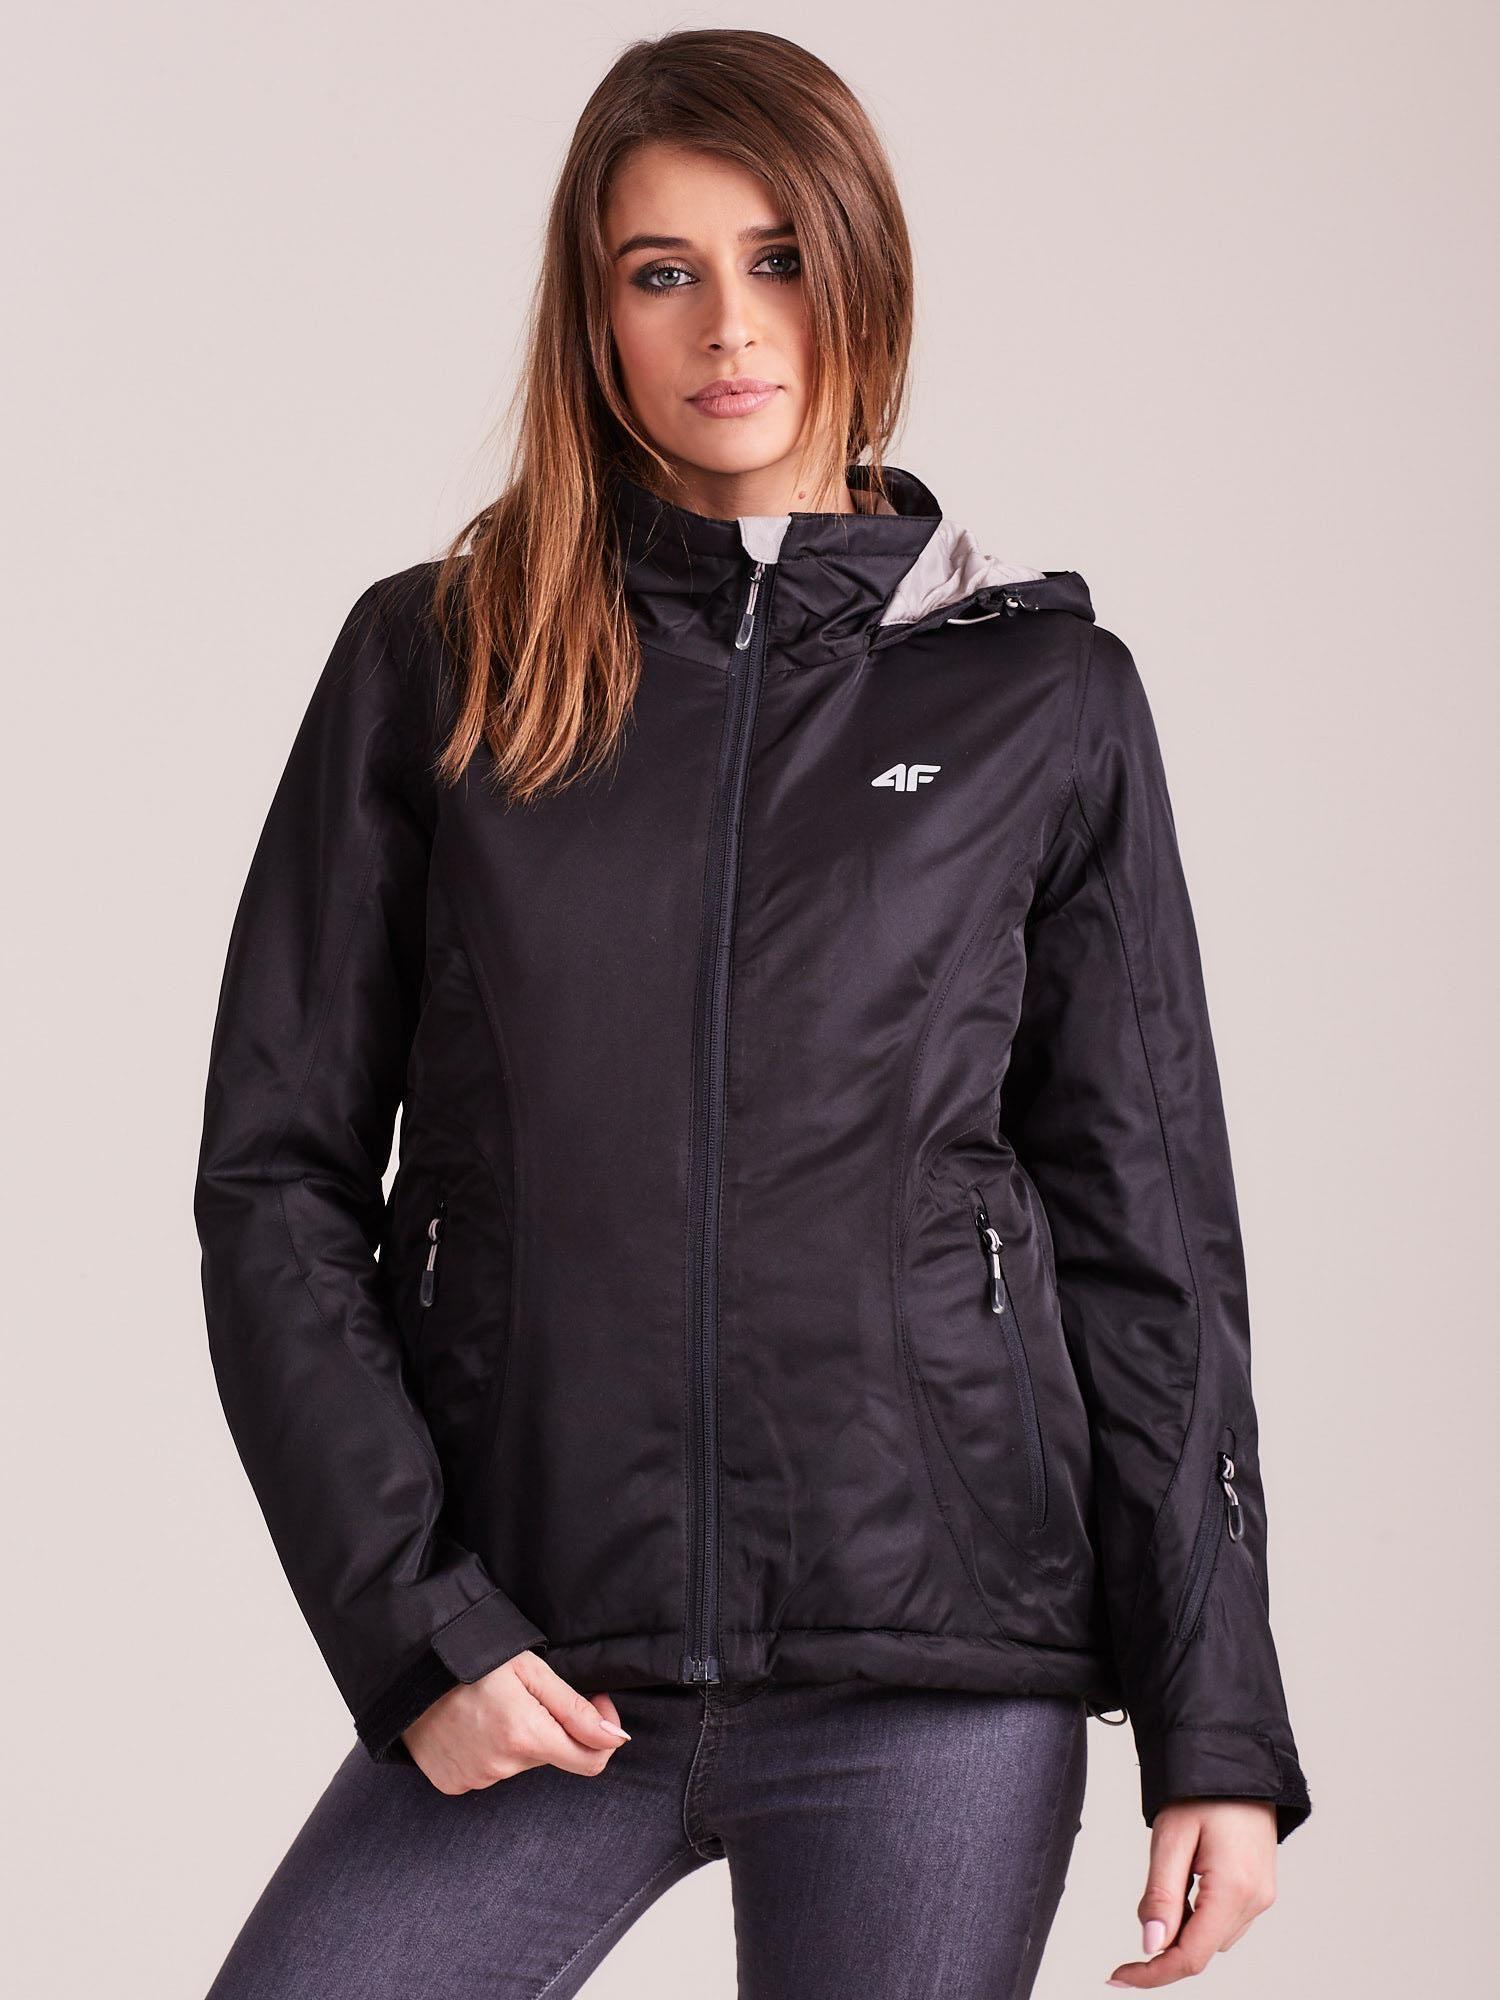 Dámska čierna lyžiarska bunda - XS